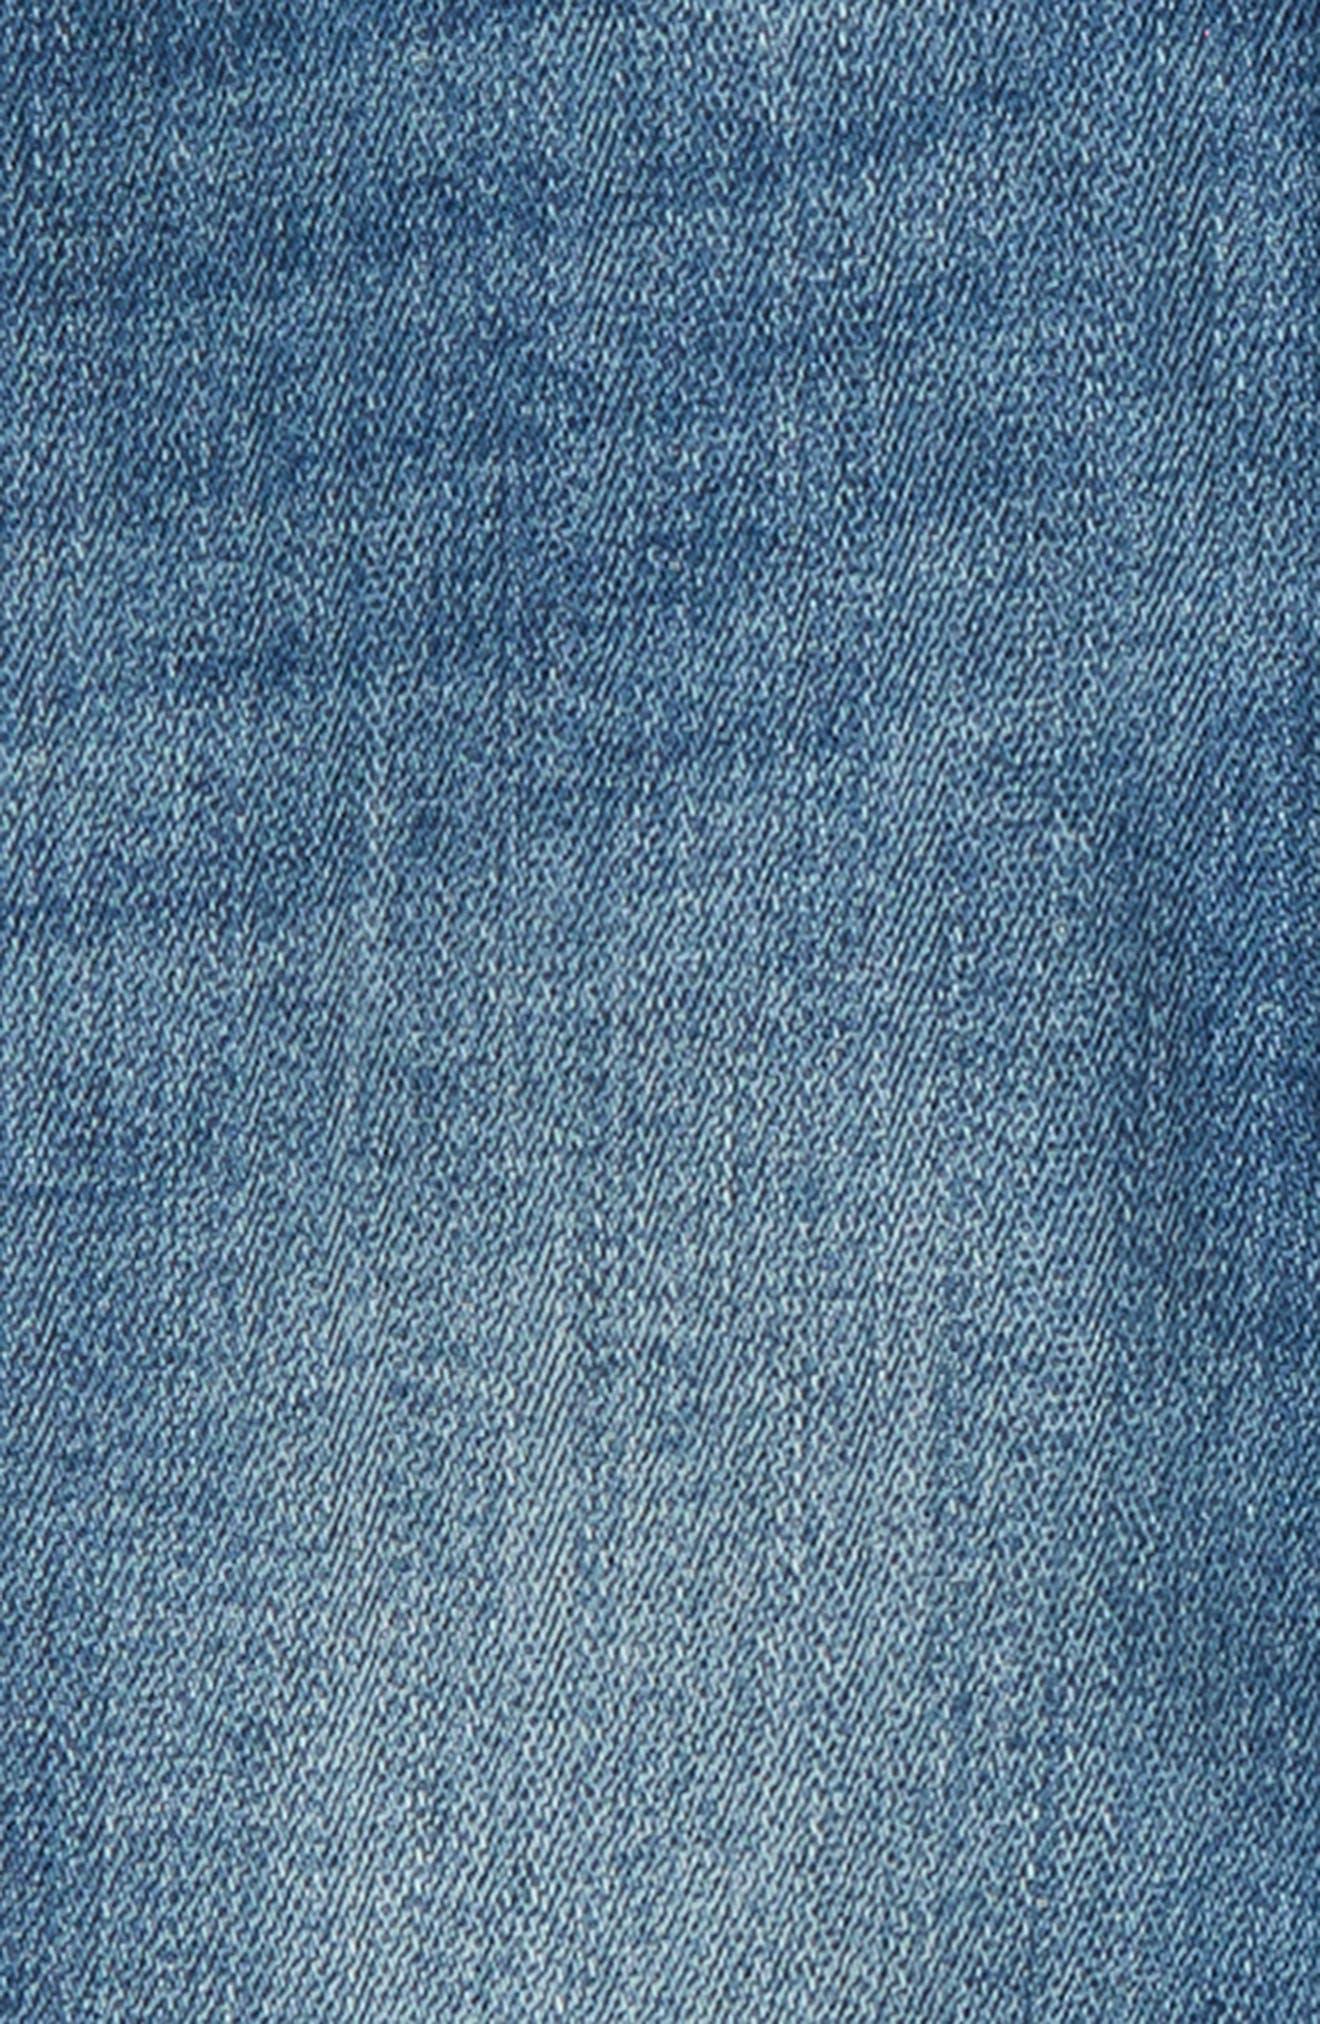 Crop Jeans,                             Alternate thumbnail 3, color,                             Lagoon Wash